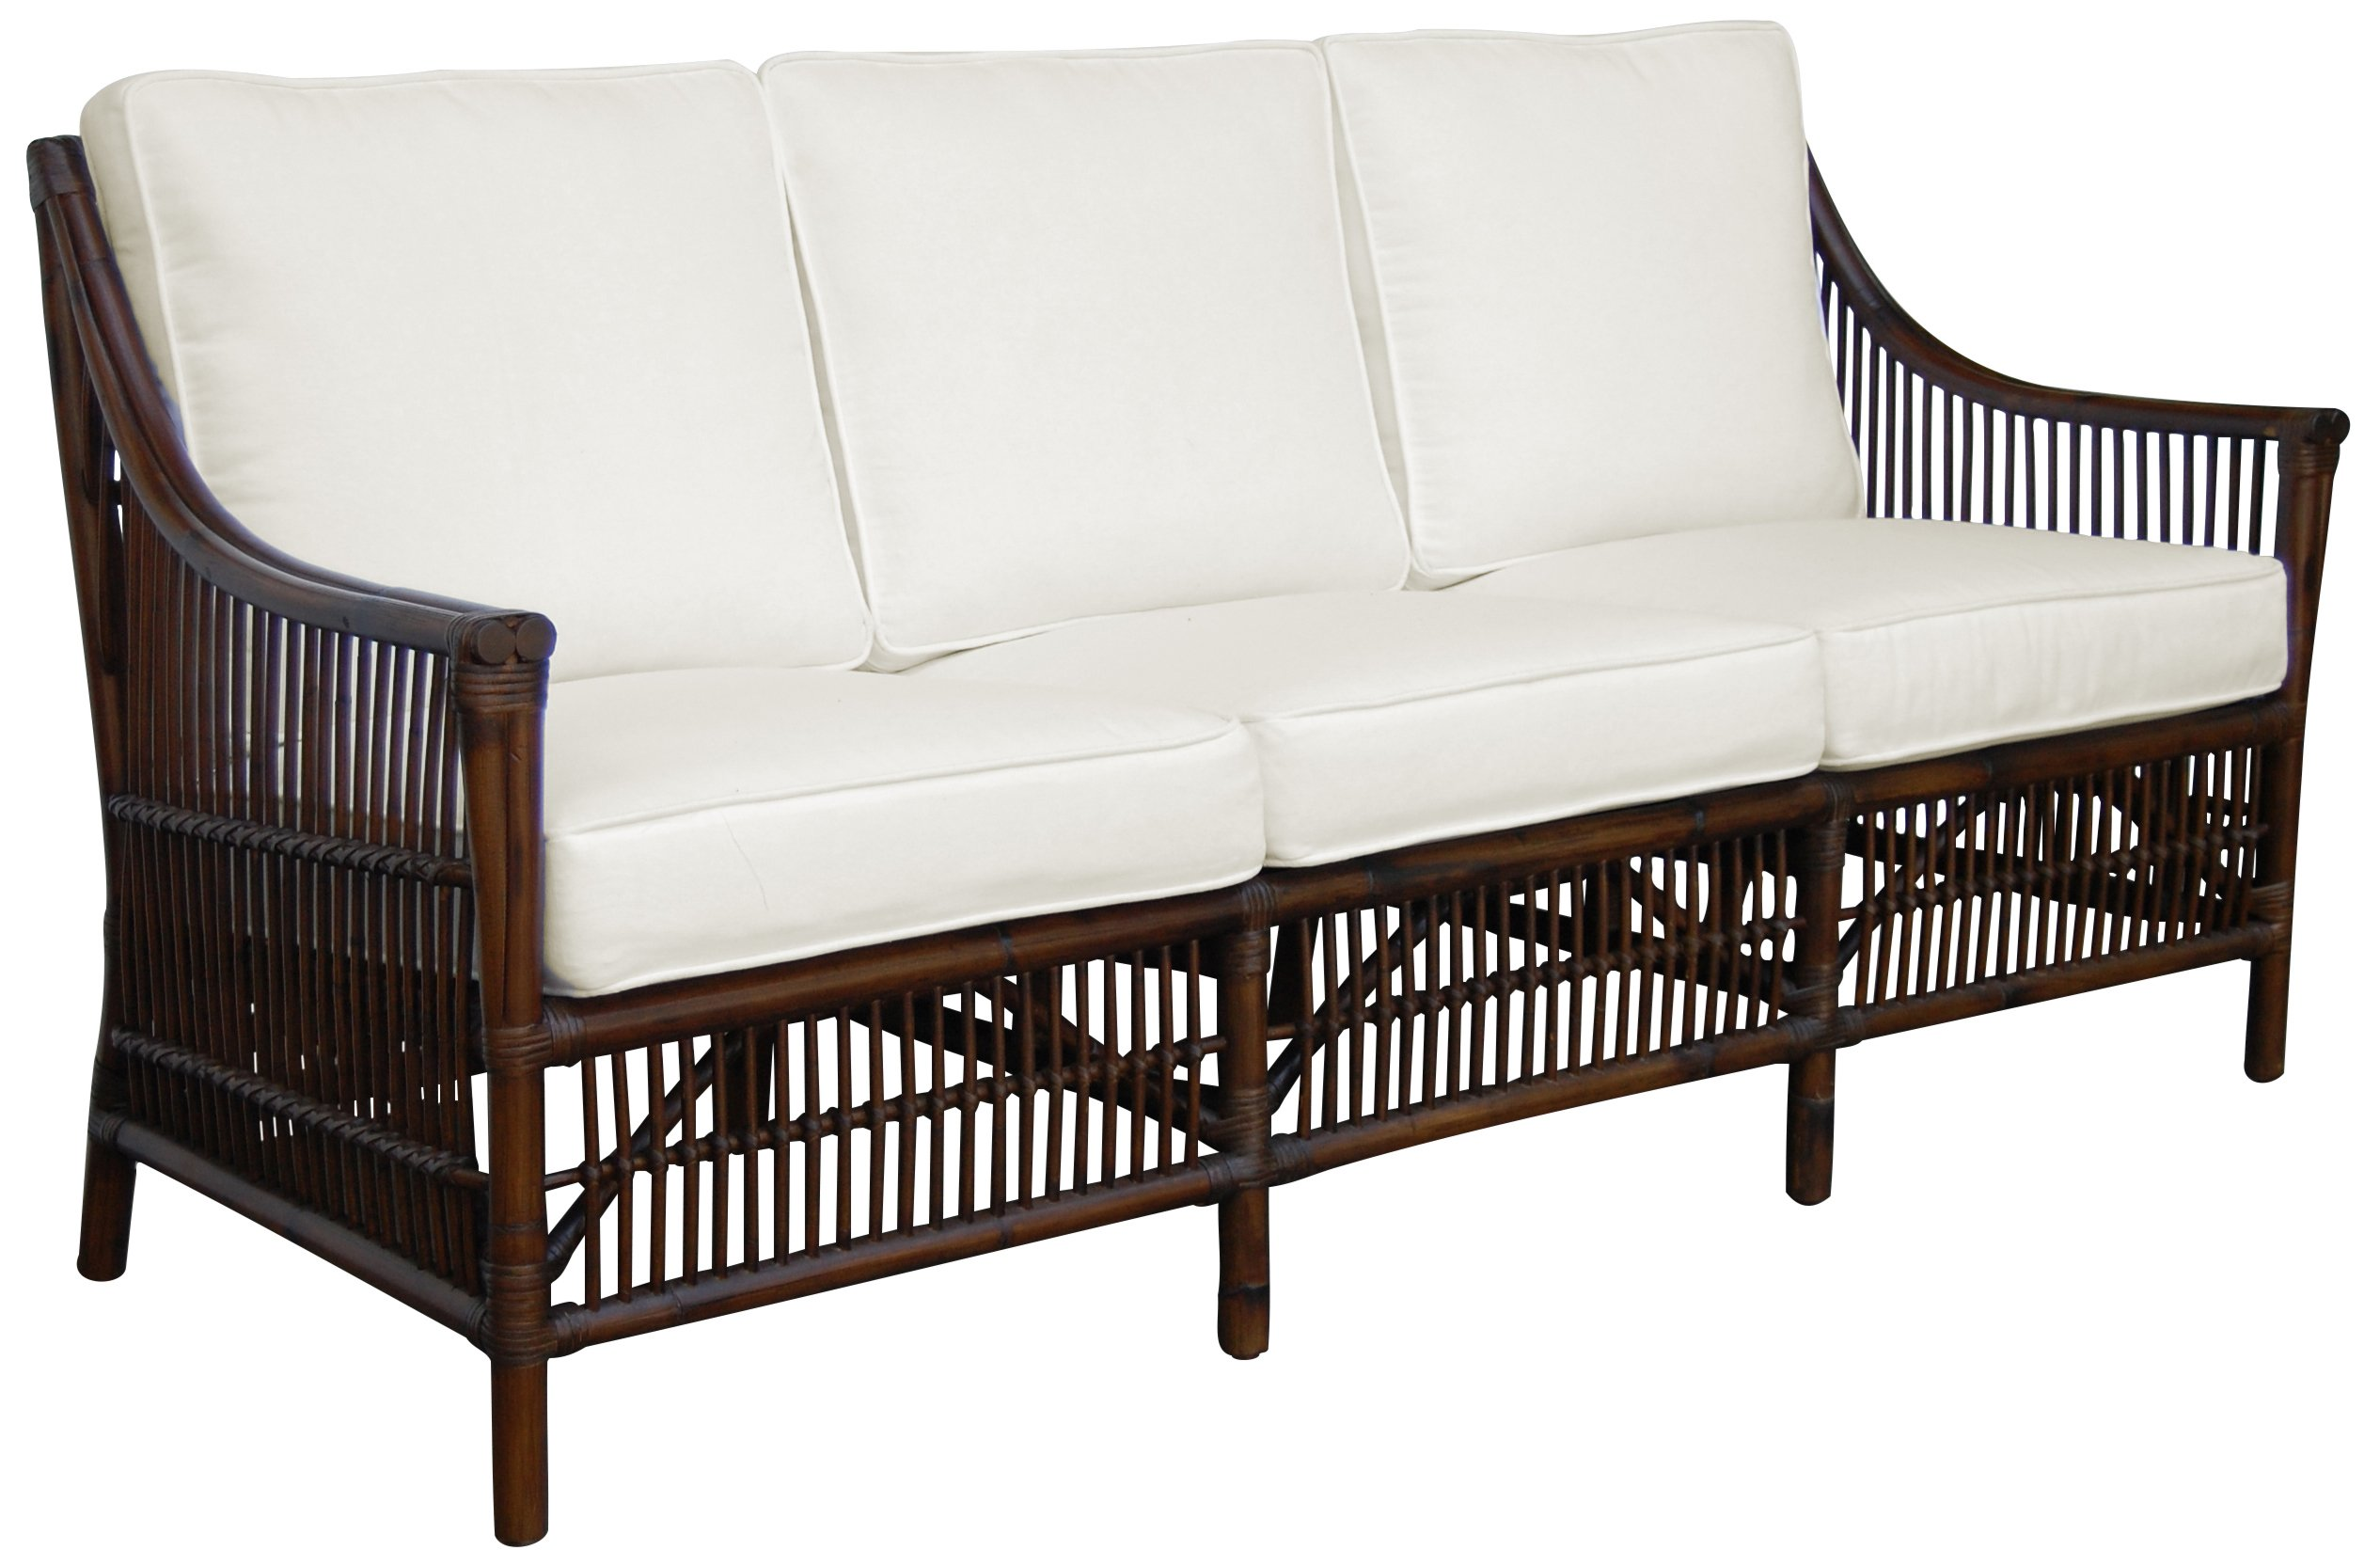 Panama Jack Sunrooms PJS-2001-ATQ-S Bora Bora Sofa with Cushions, Light Beige